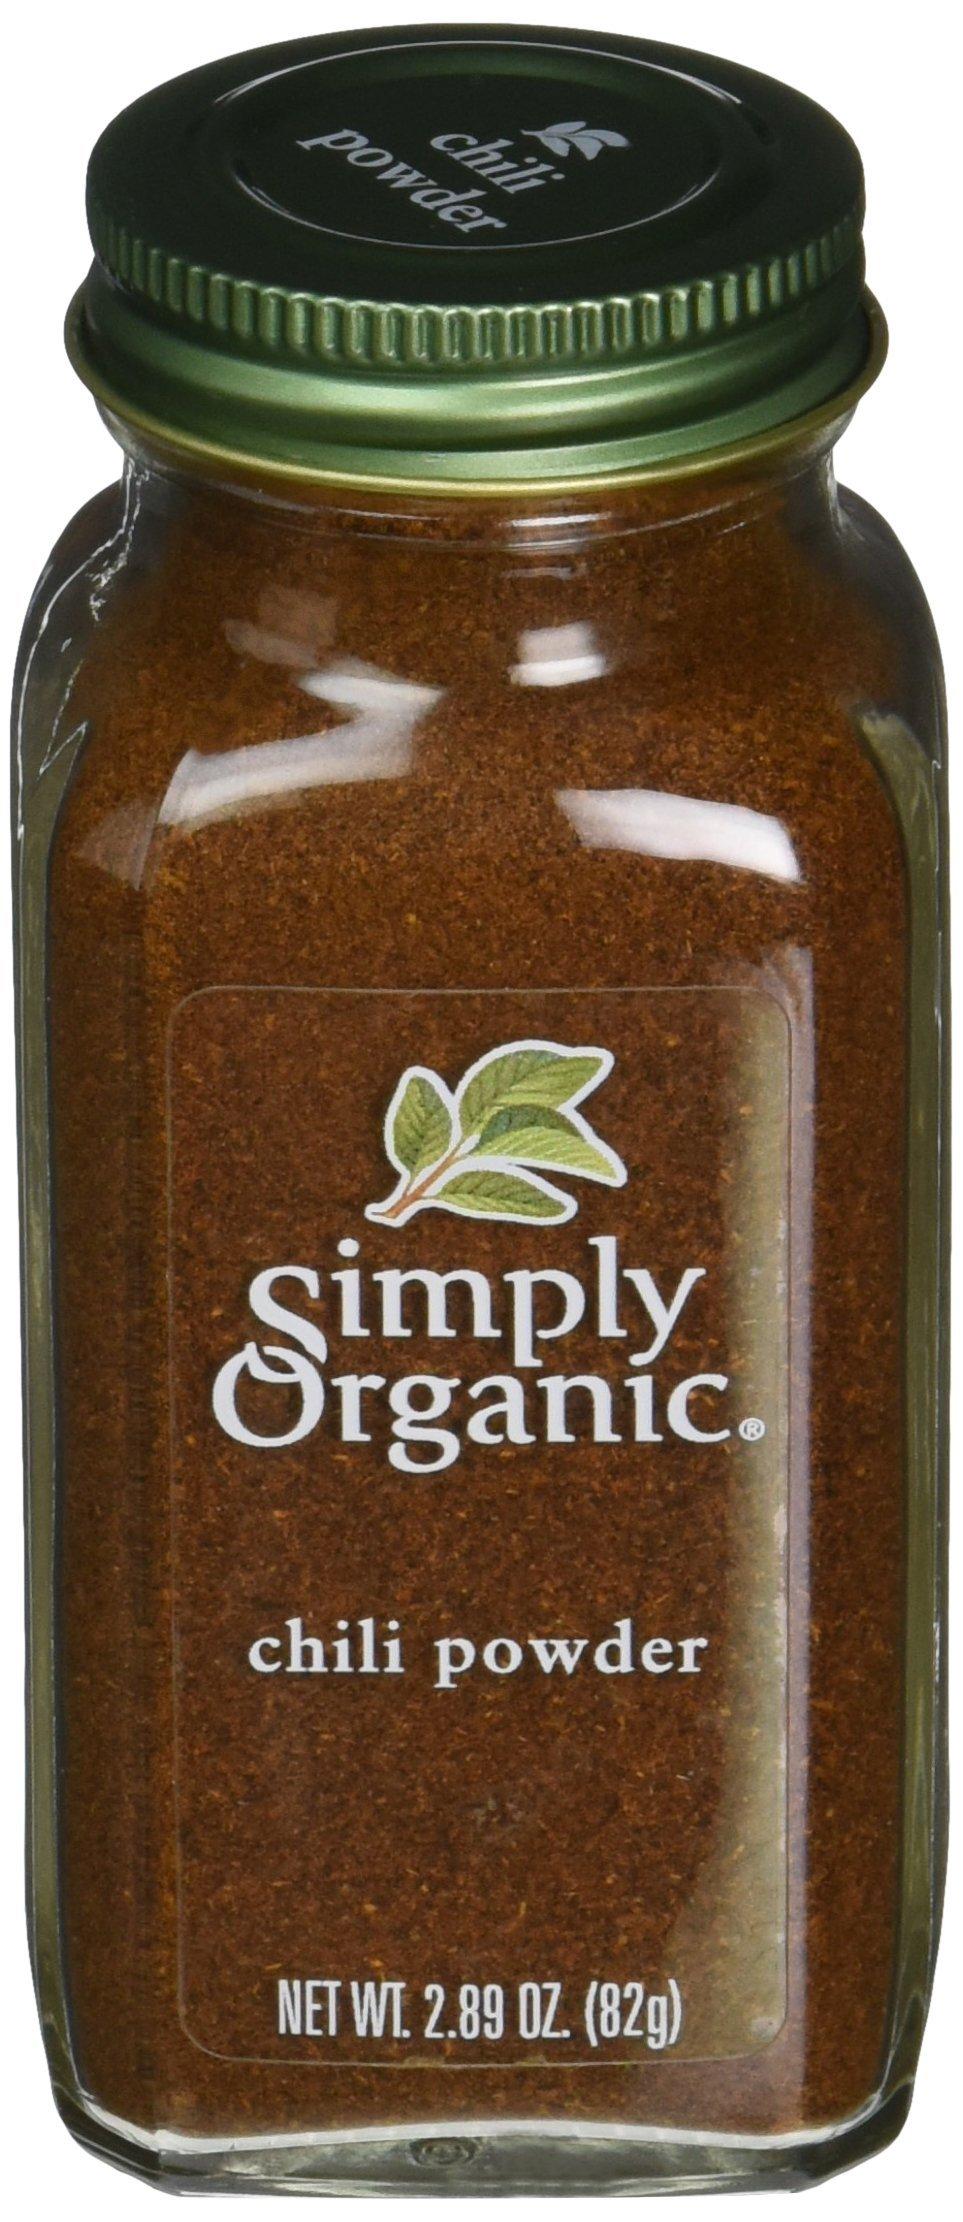 Simply Organic Chili Powder, 2.89 Ounce - 6 per case